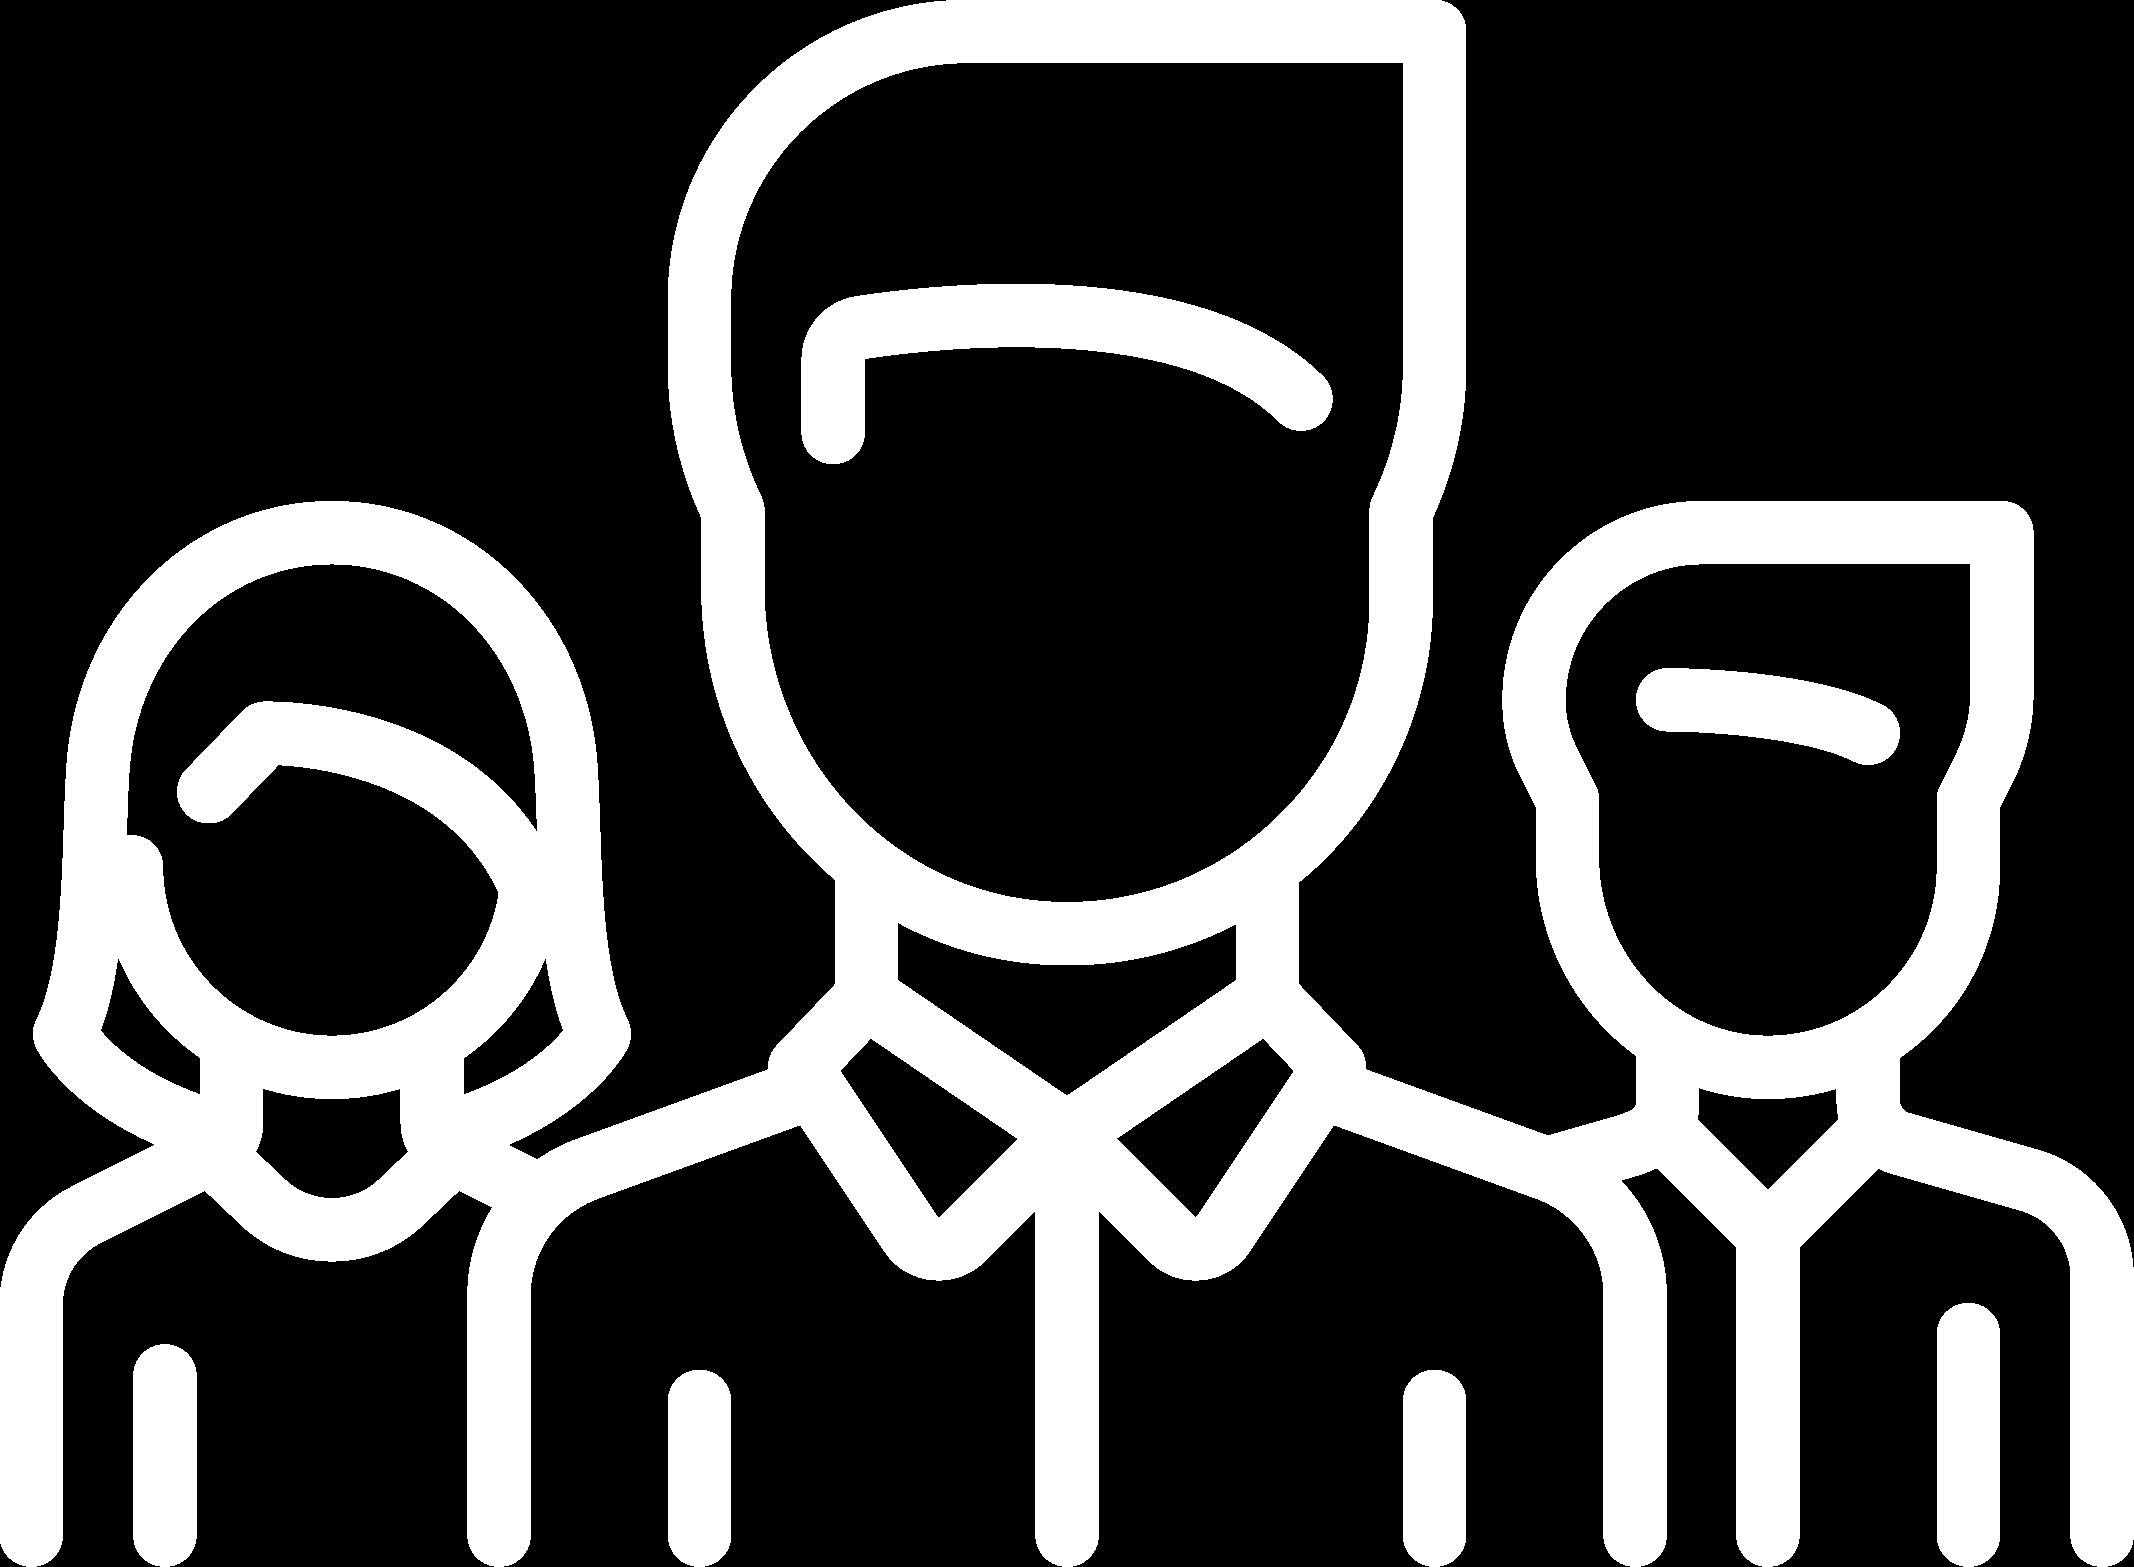 003-team